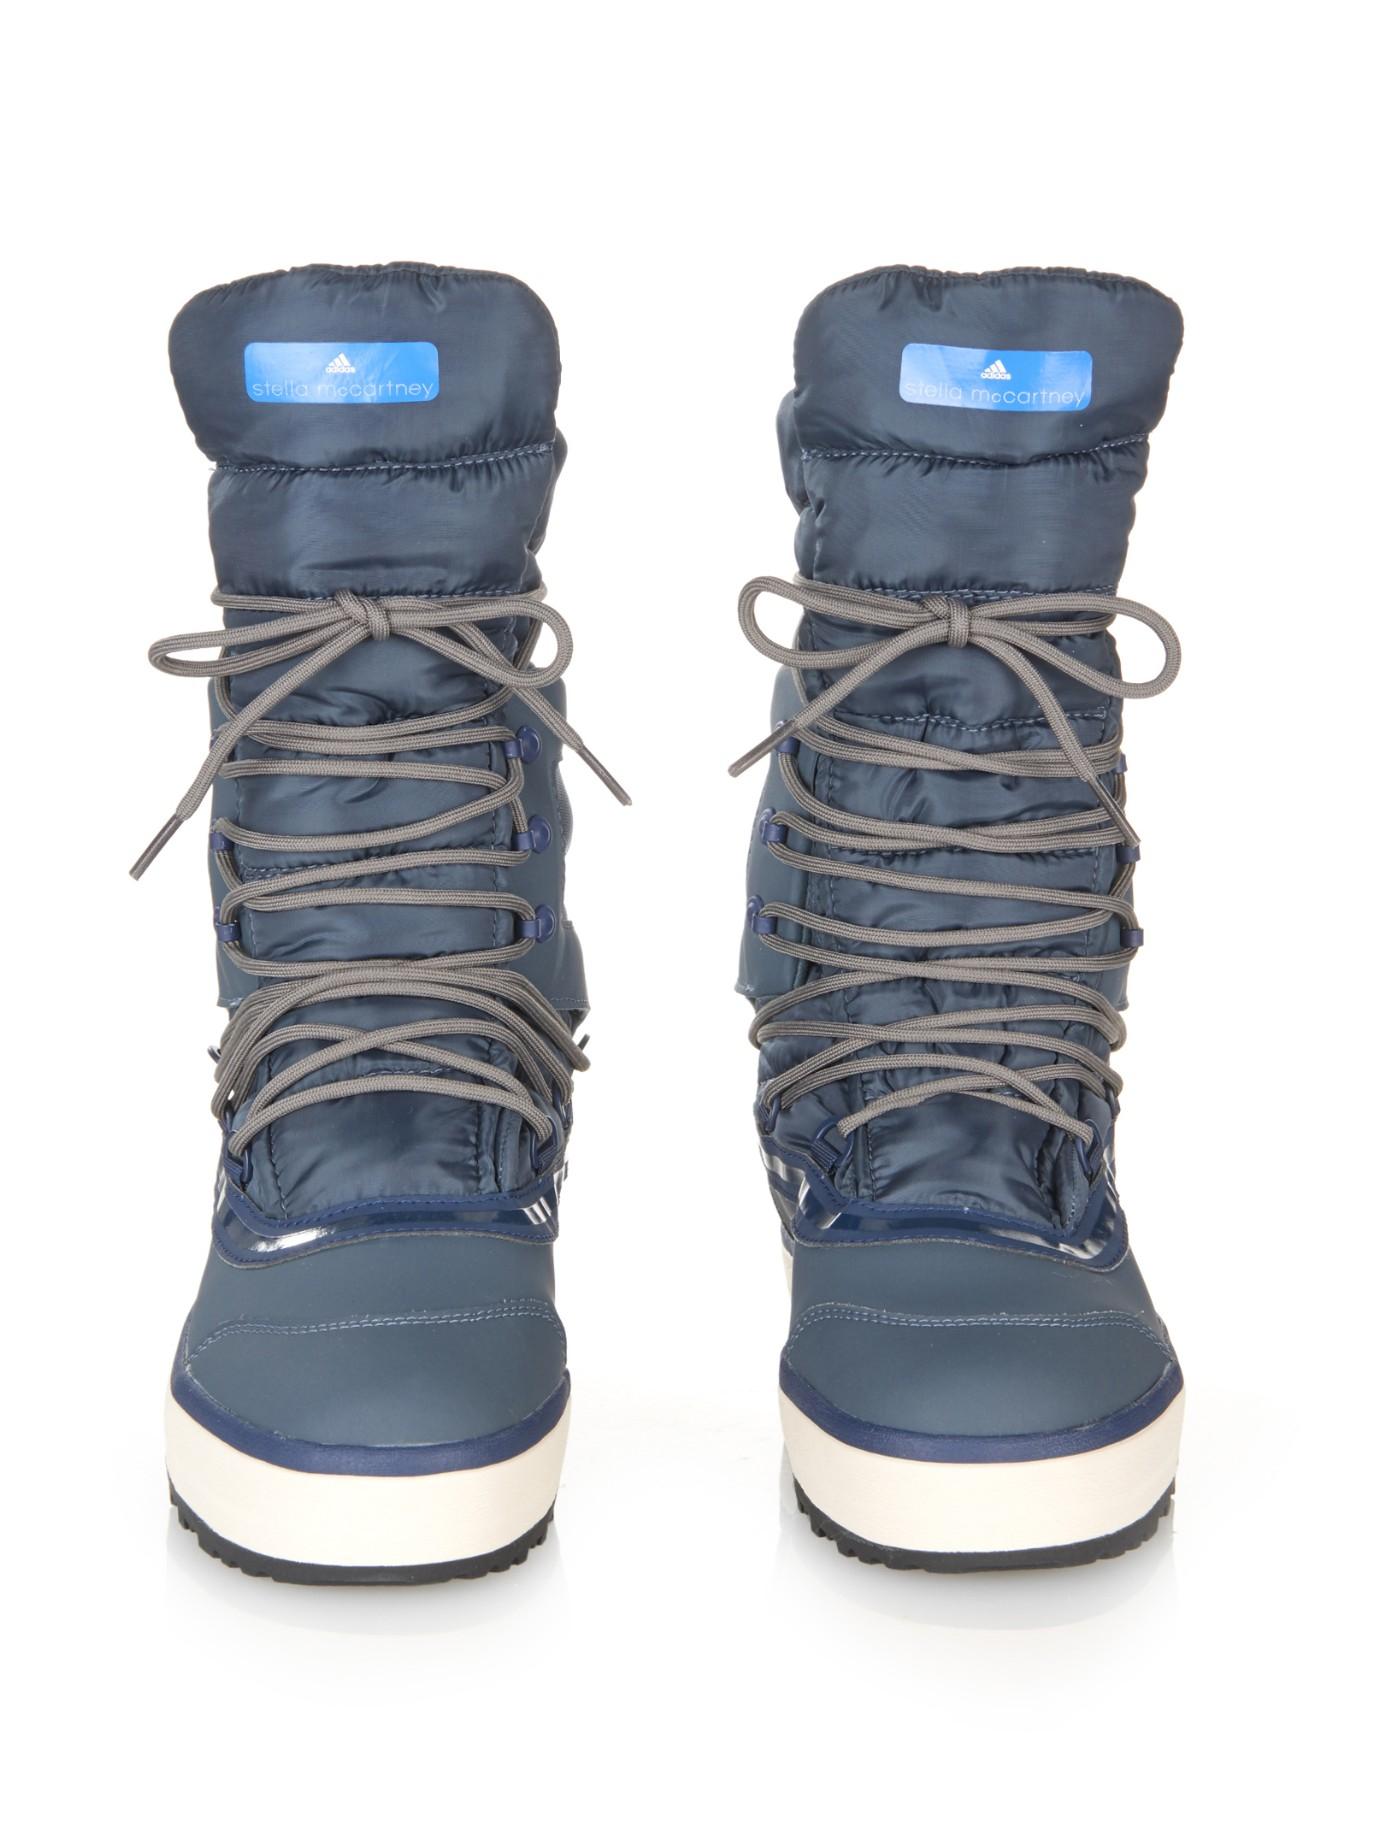 Lyst Adidas By Stella Mccartney Nangator Snow Boots In Blue